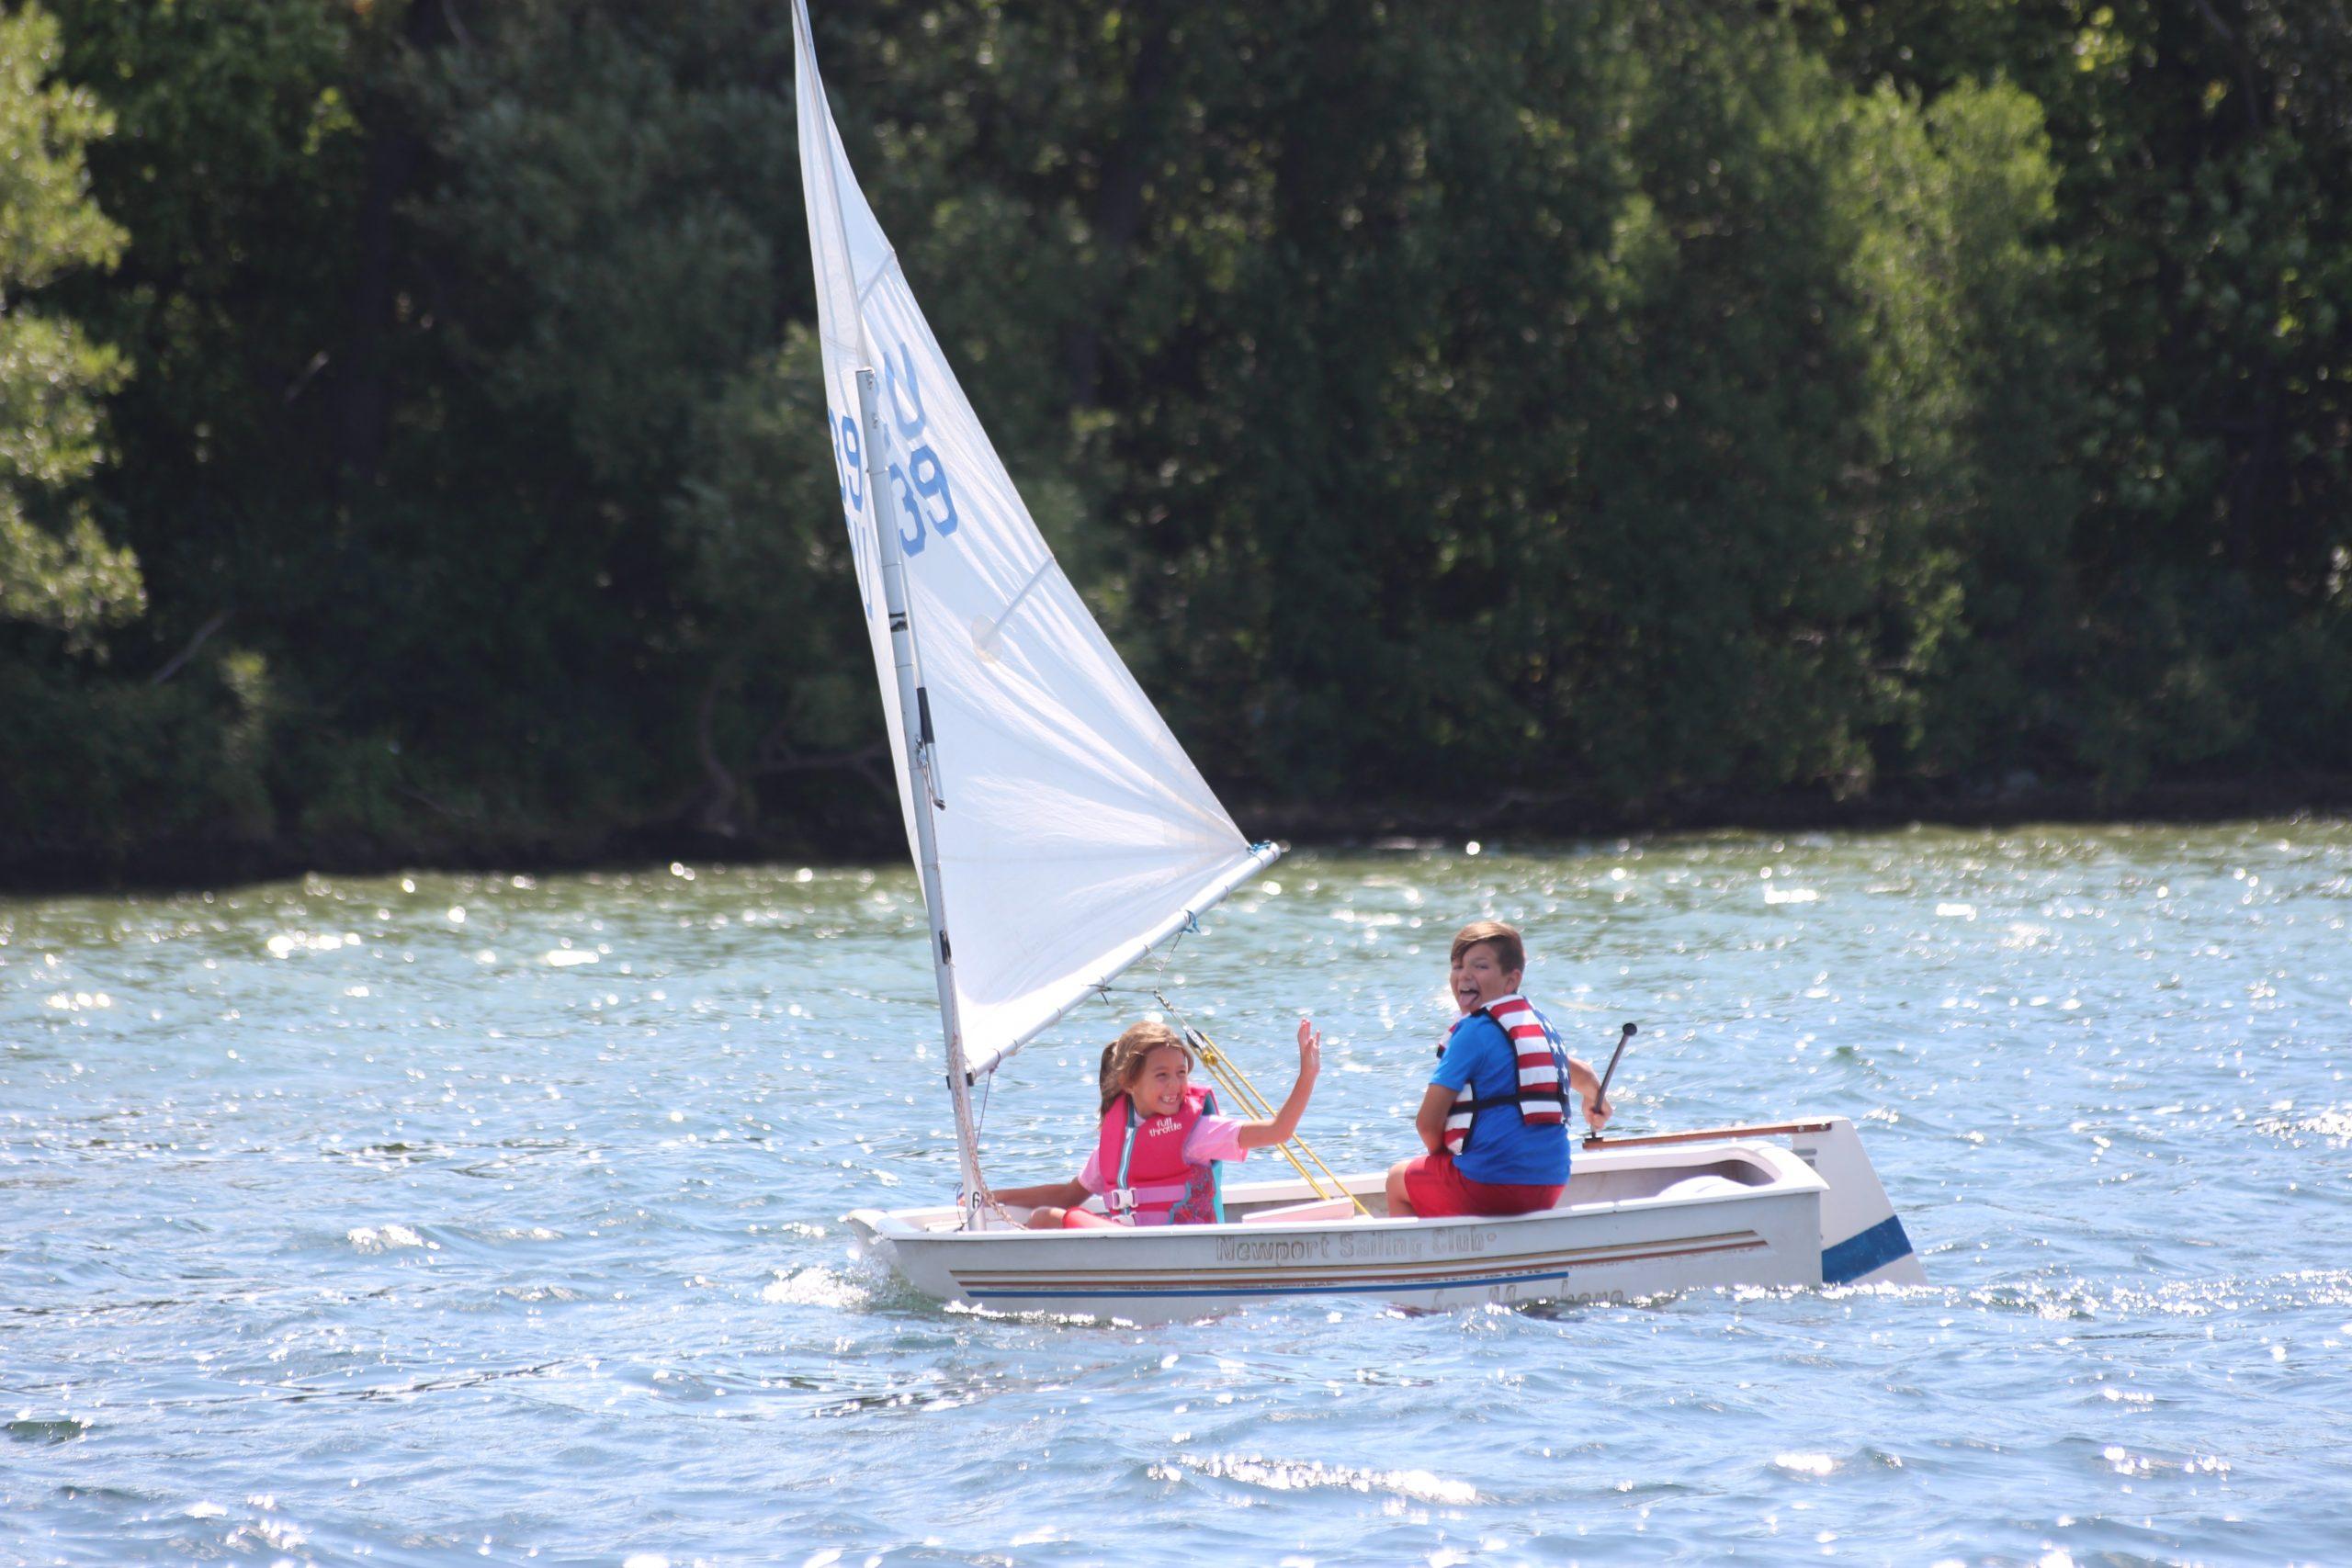 Kids sailing in an Optimist Pram sailing dinghy